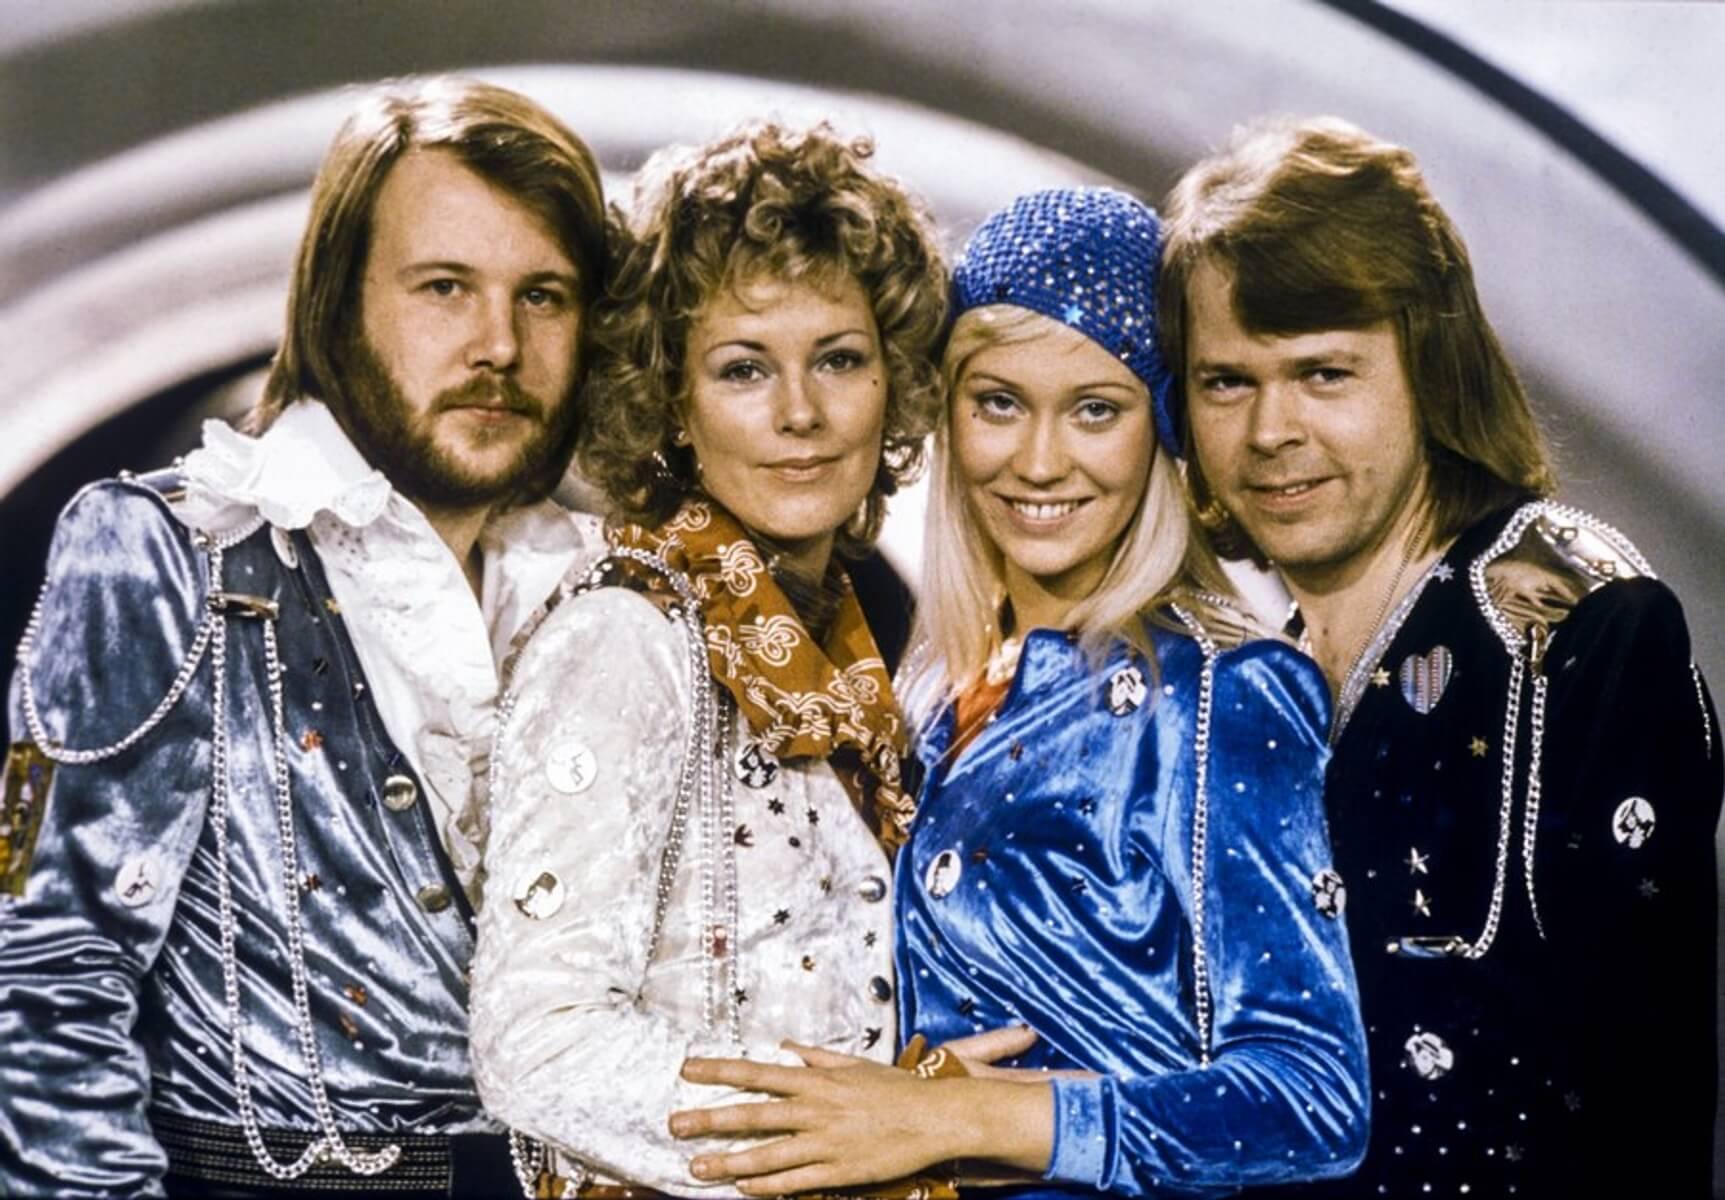 ABBA η επιστροφή! Νέα τραγούδια μετά από 35 χρόνια!